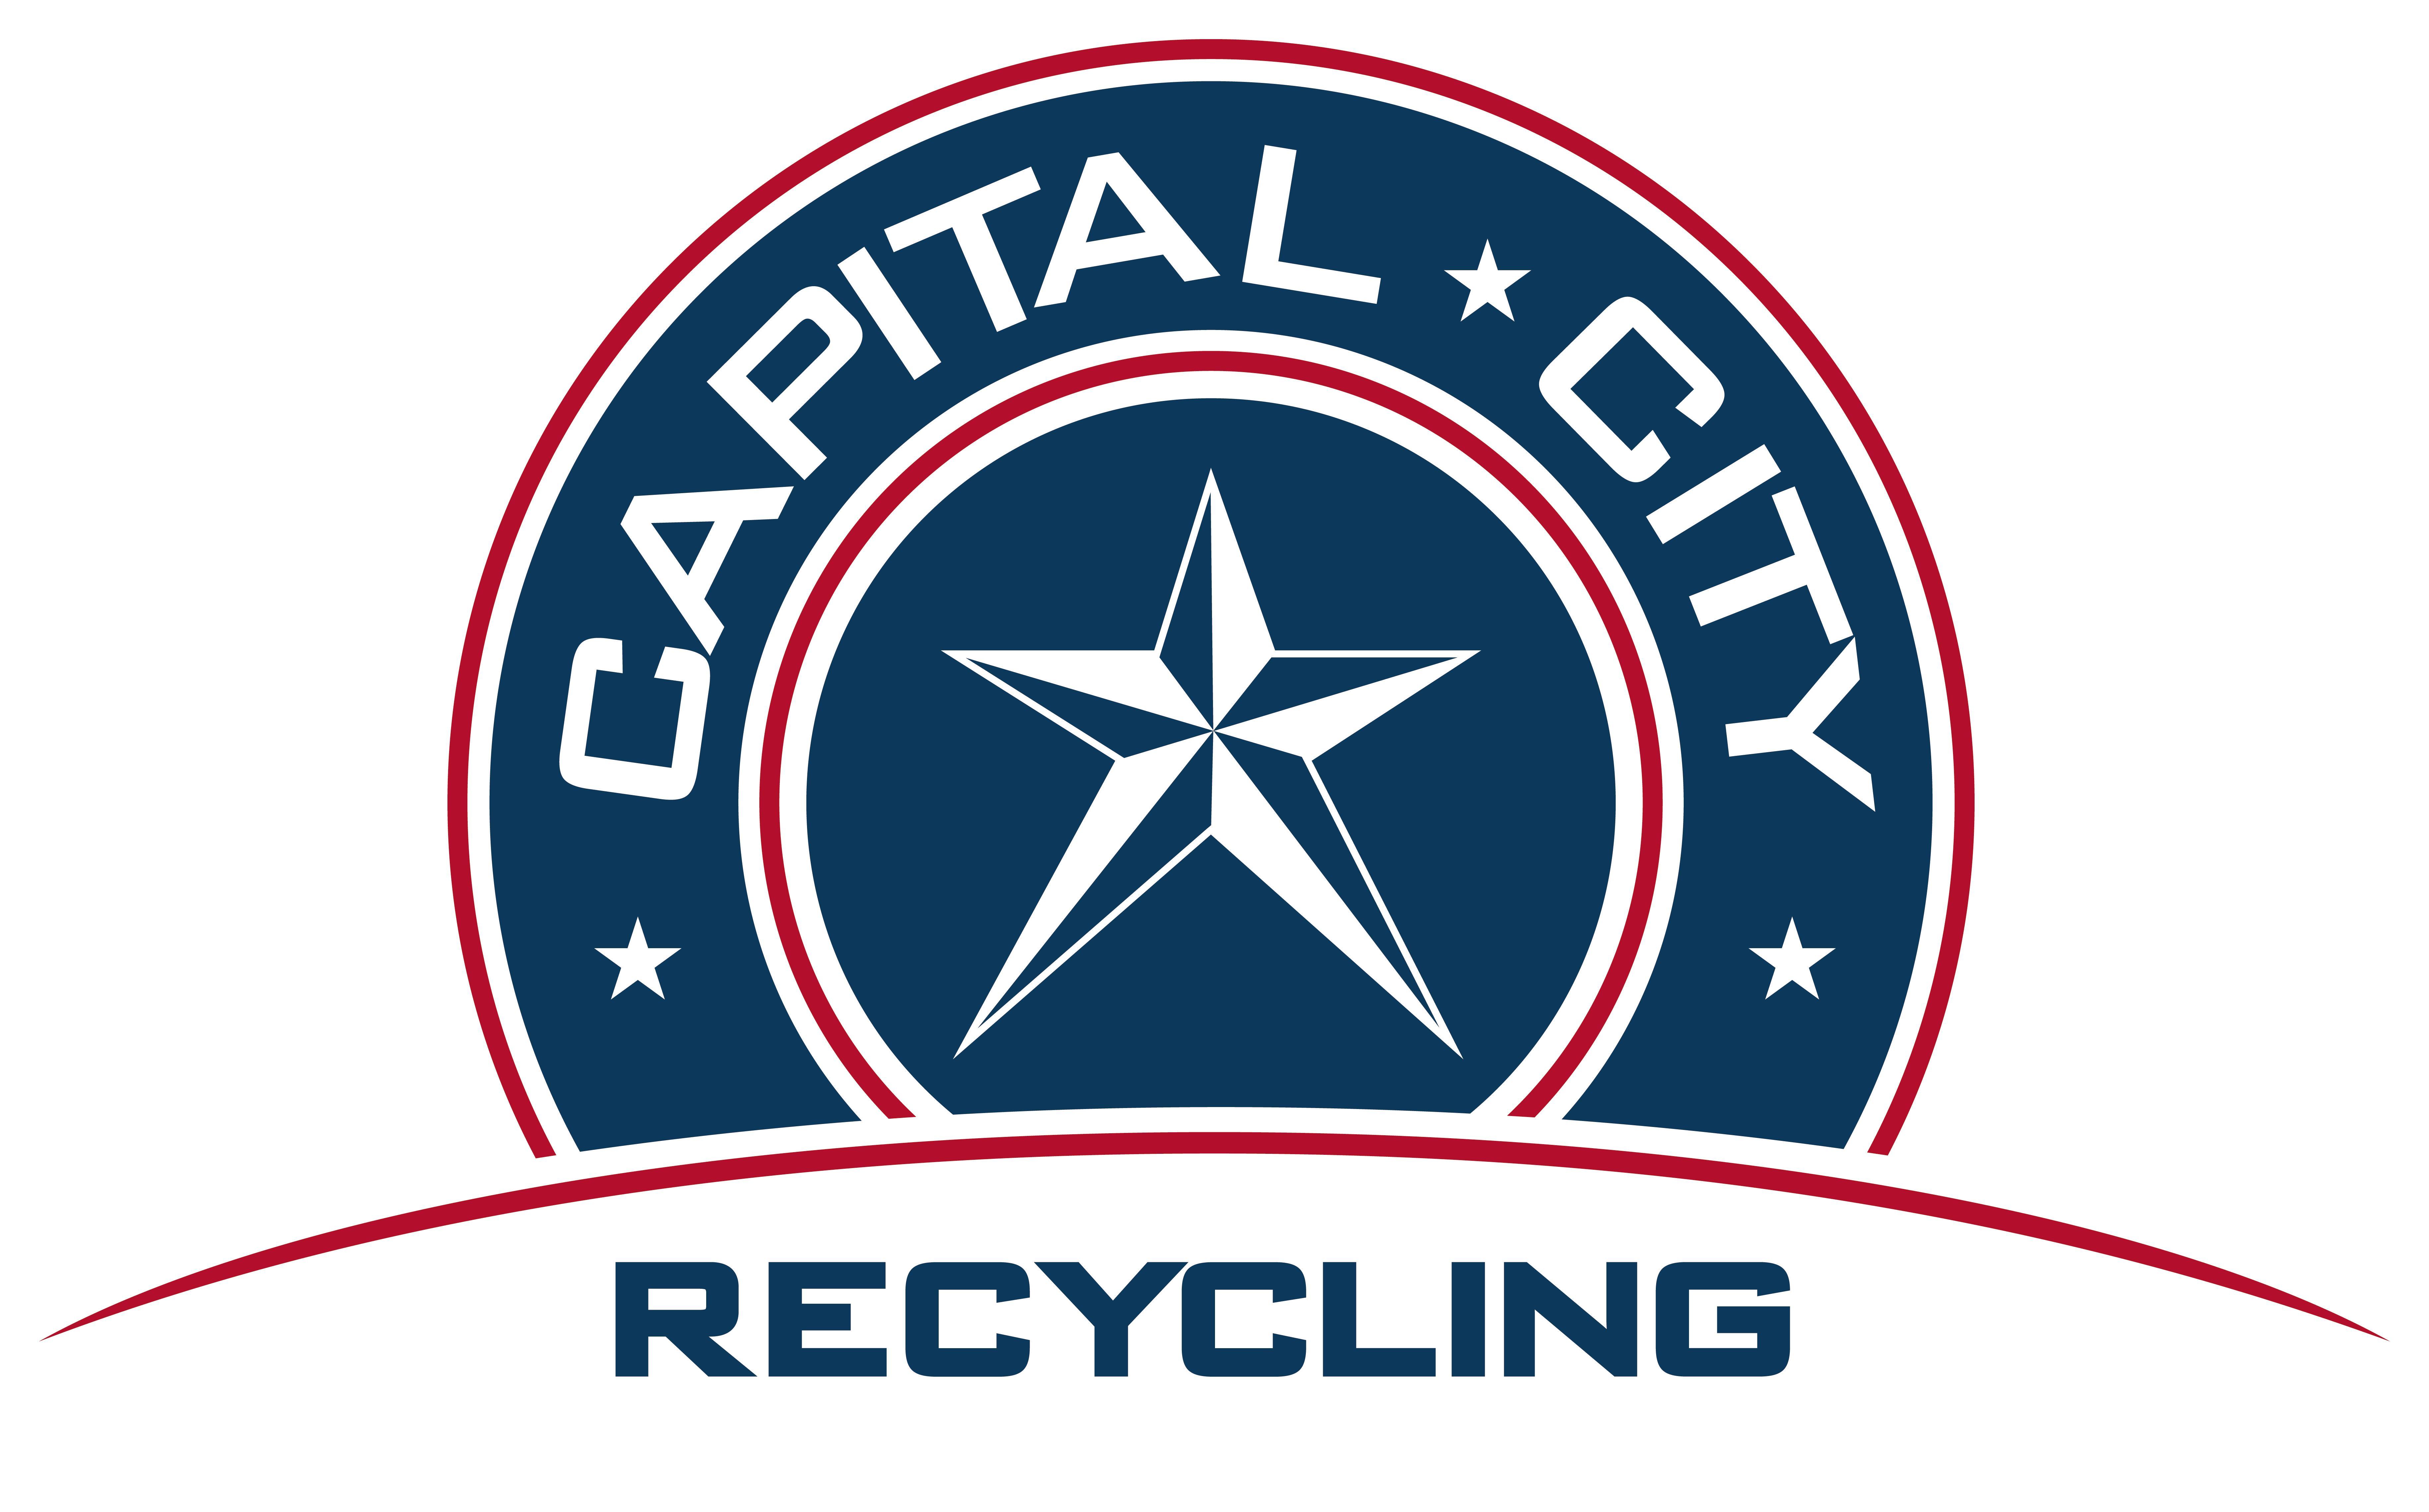 Capital City Recycling Inc. image 10